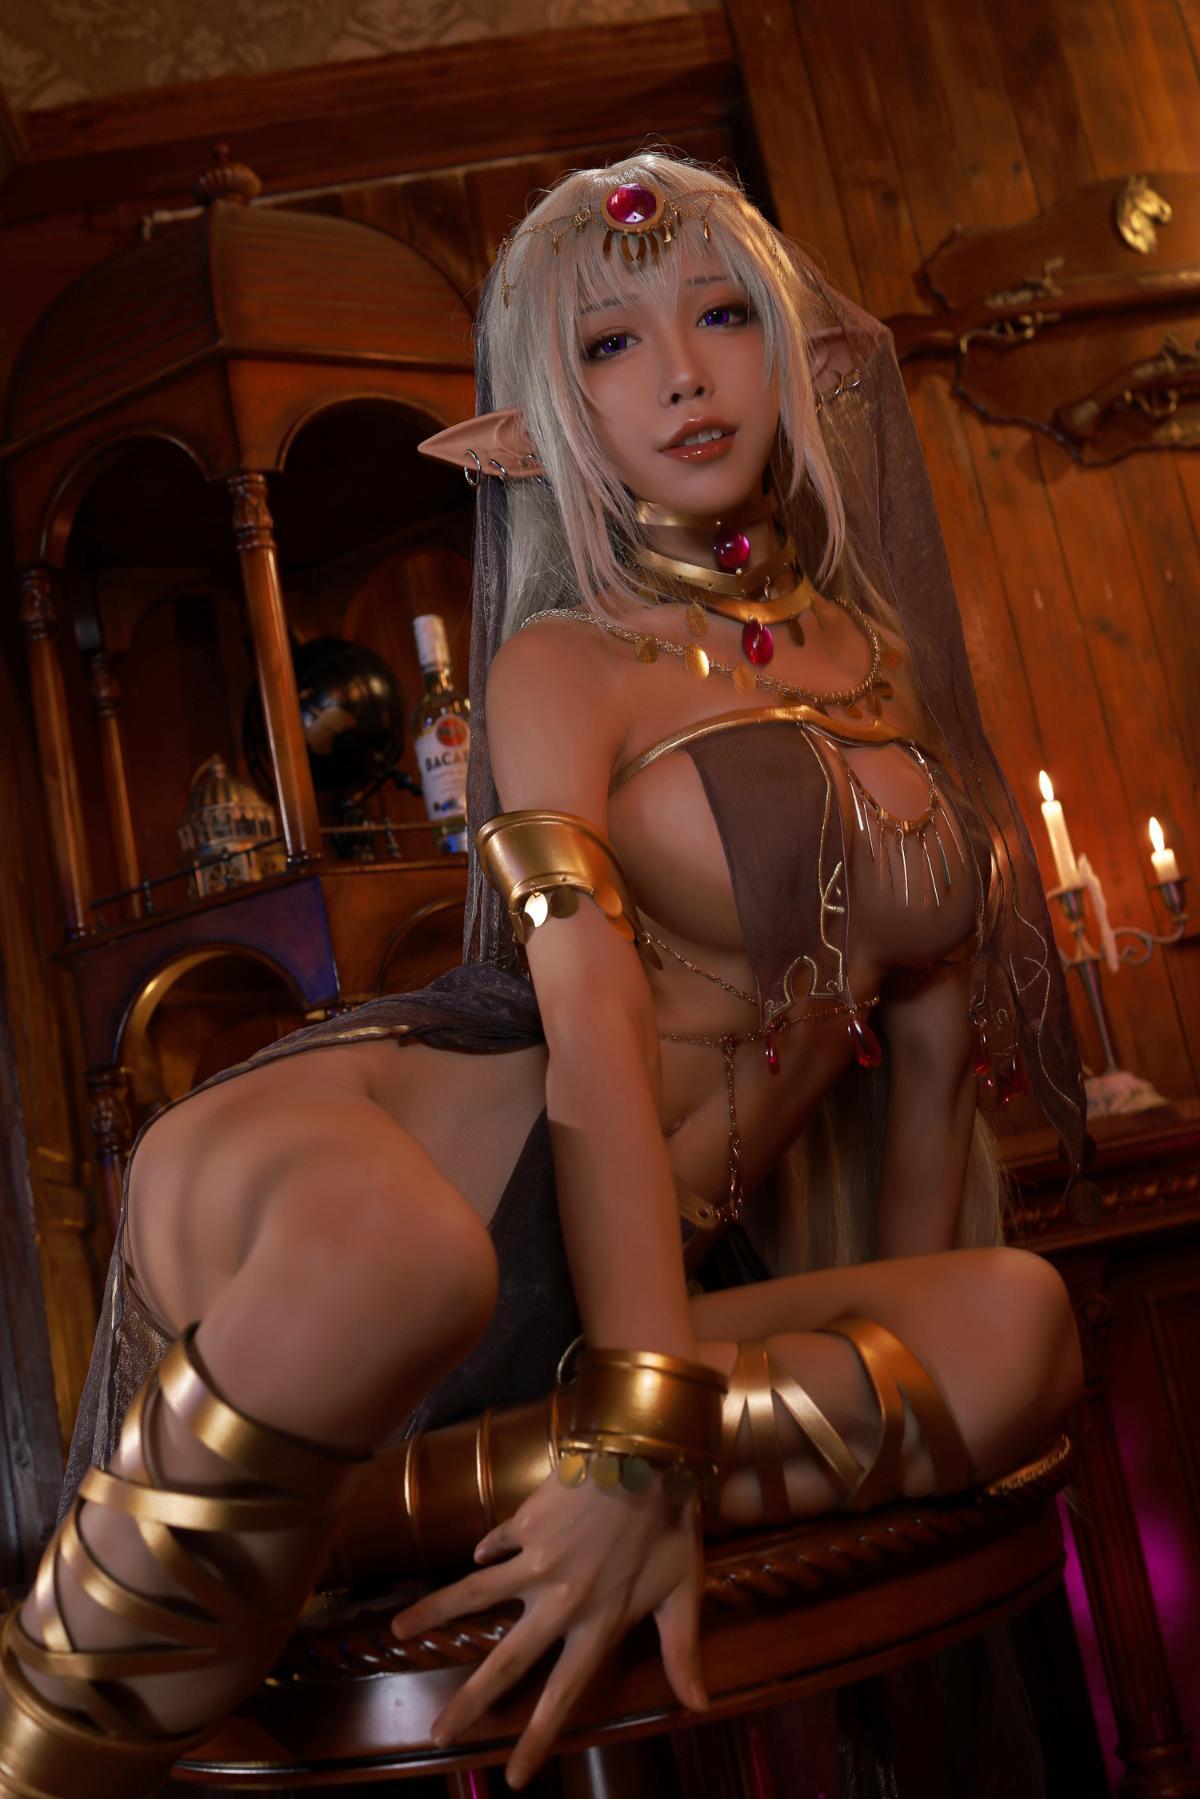 Tan Dancer Elf Succubus Cosplay by Aqua 7